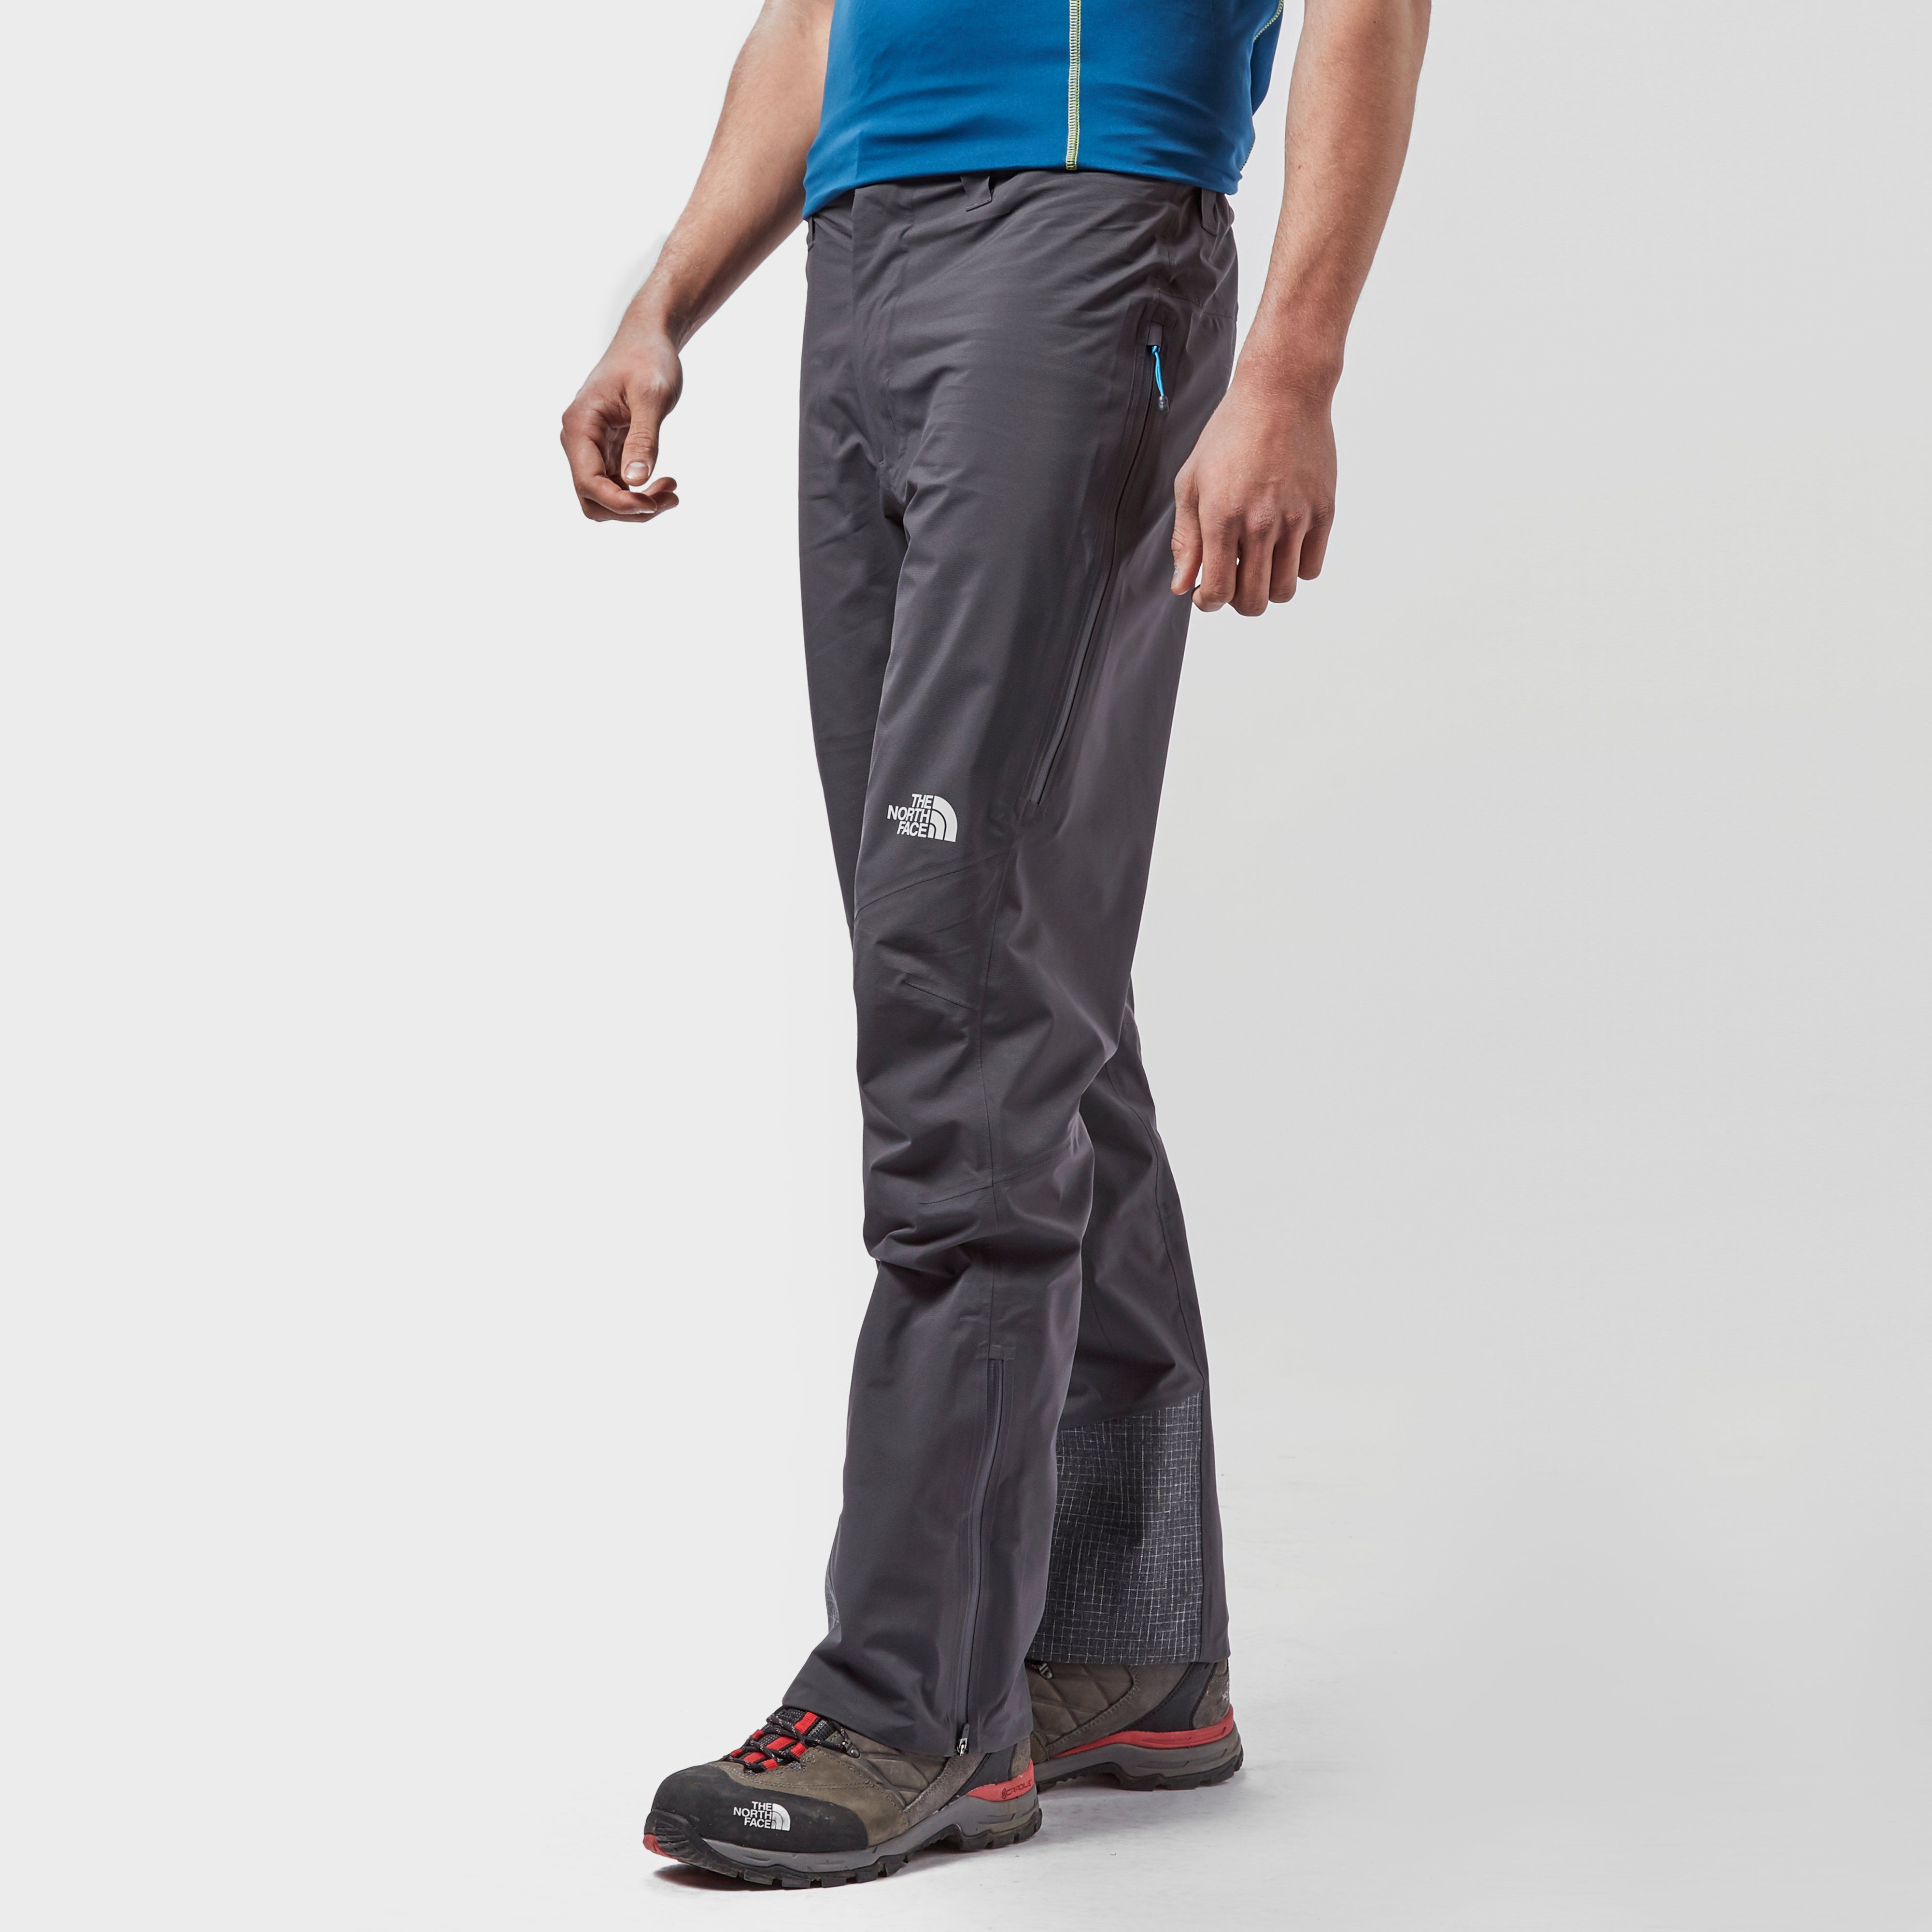 THE NORTH FACE Men's Shinpuru GORE-TEX® Trousers